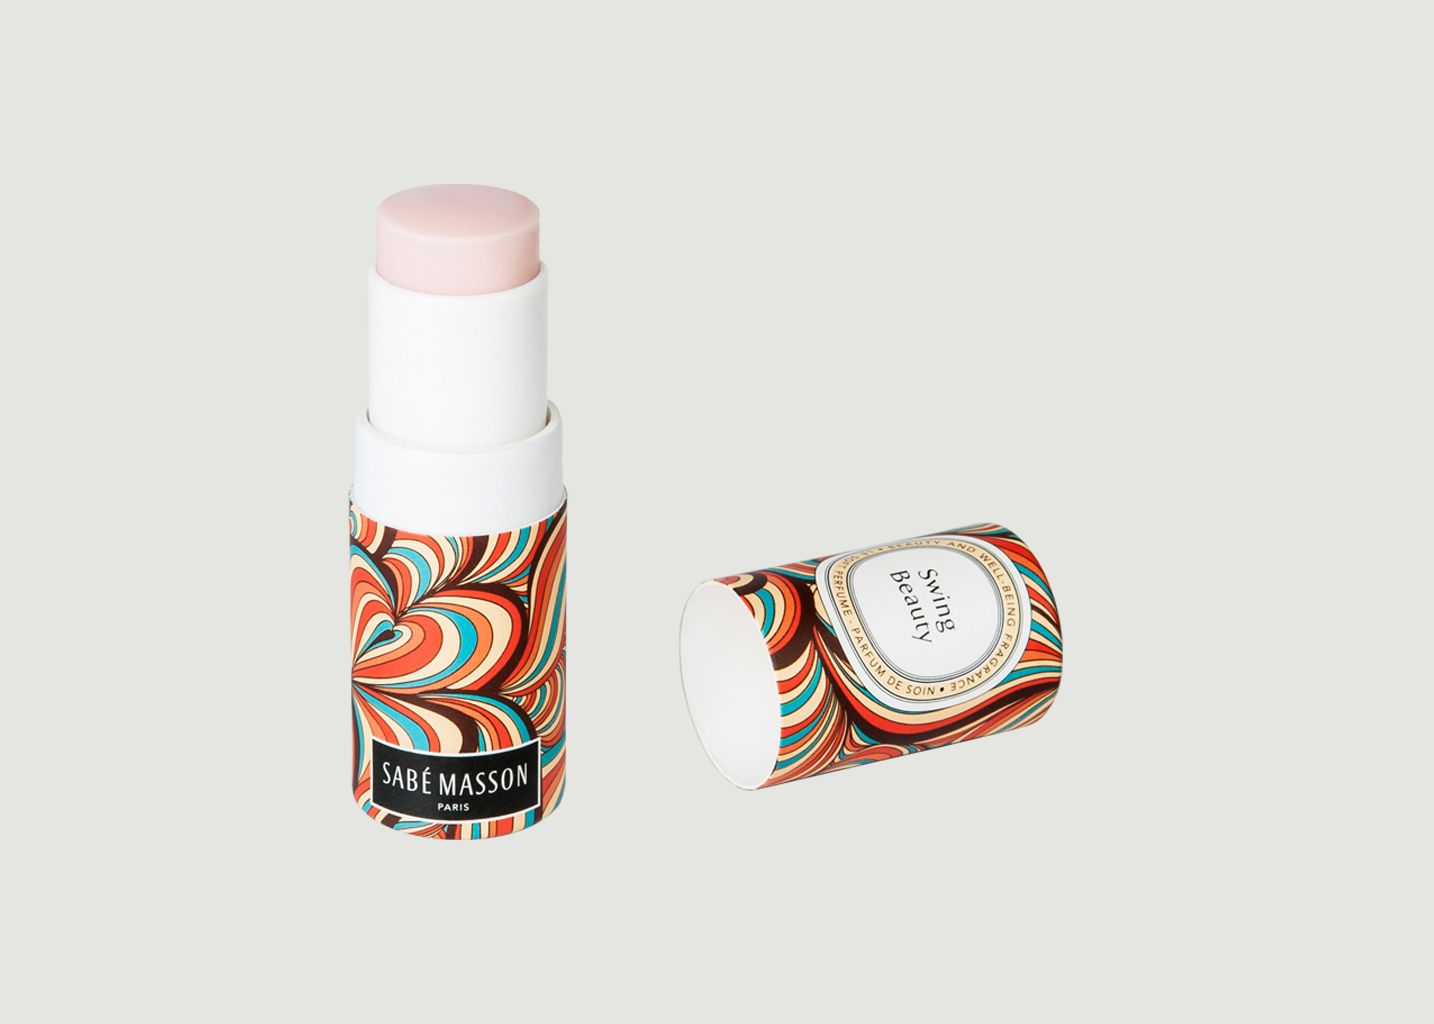 Soft Perfume Swing Beauty - Sabé Masson